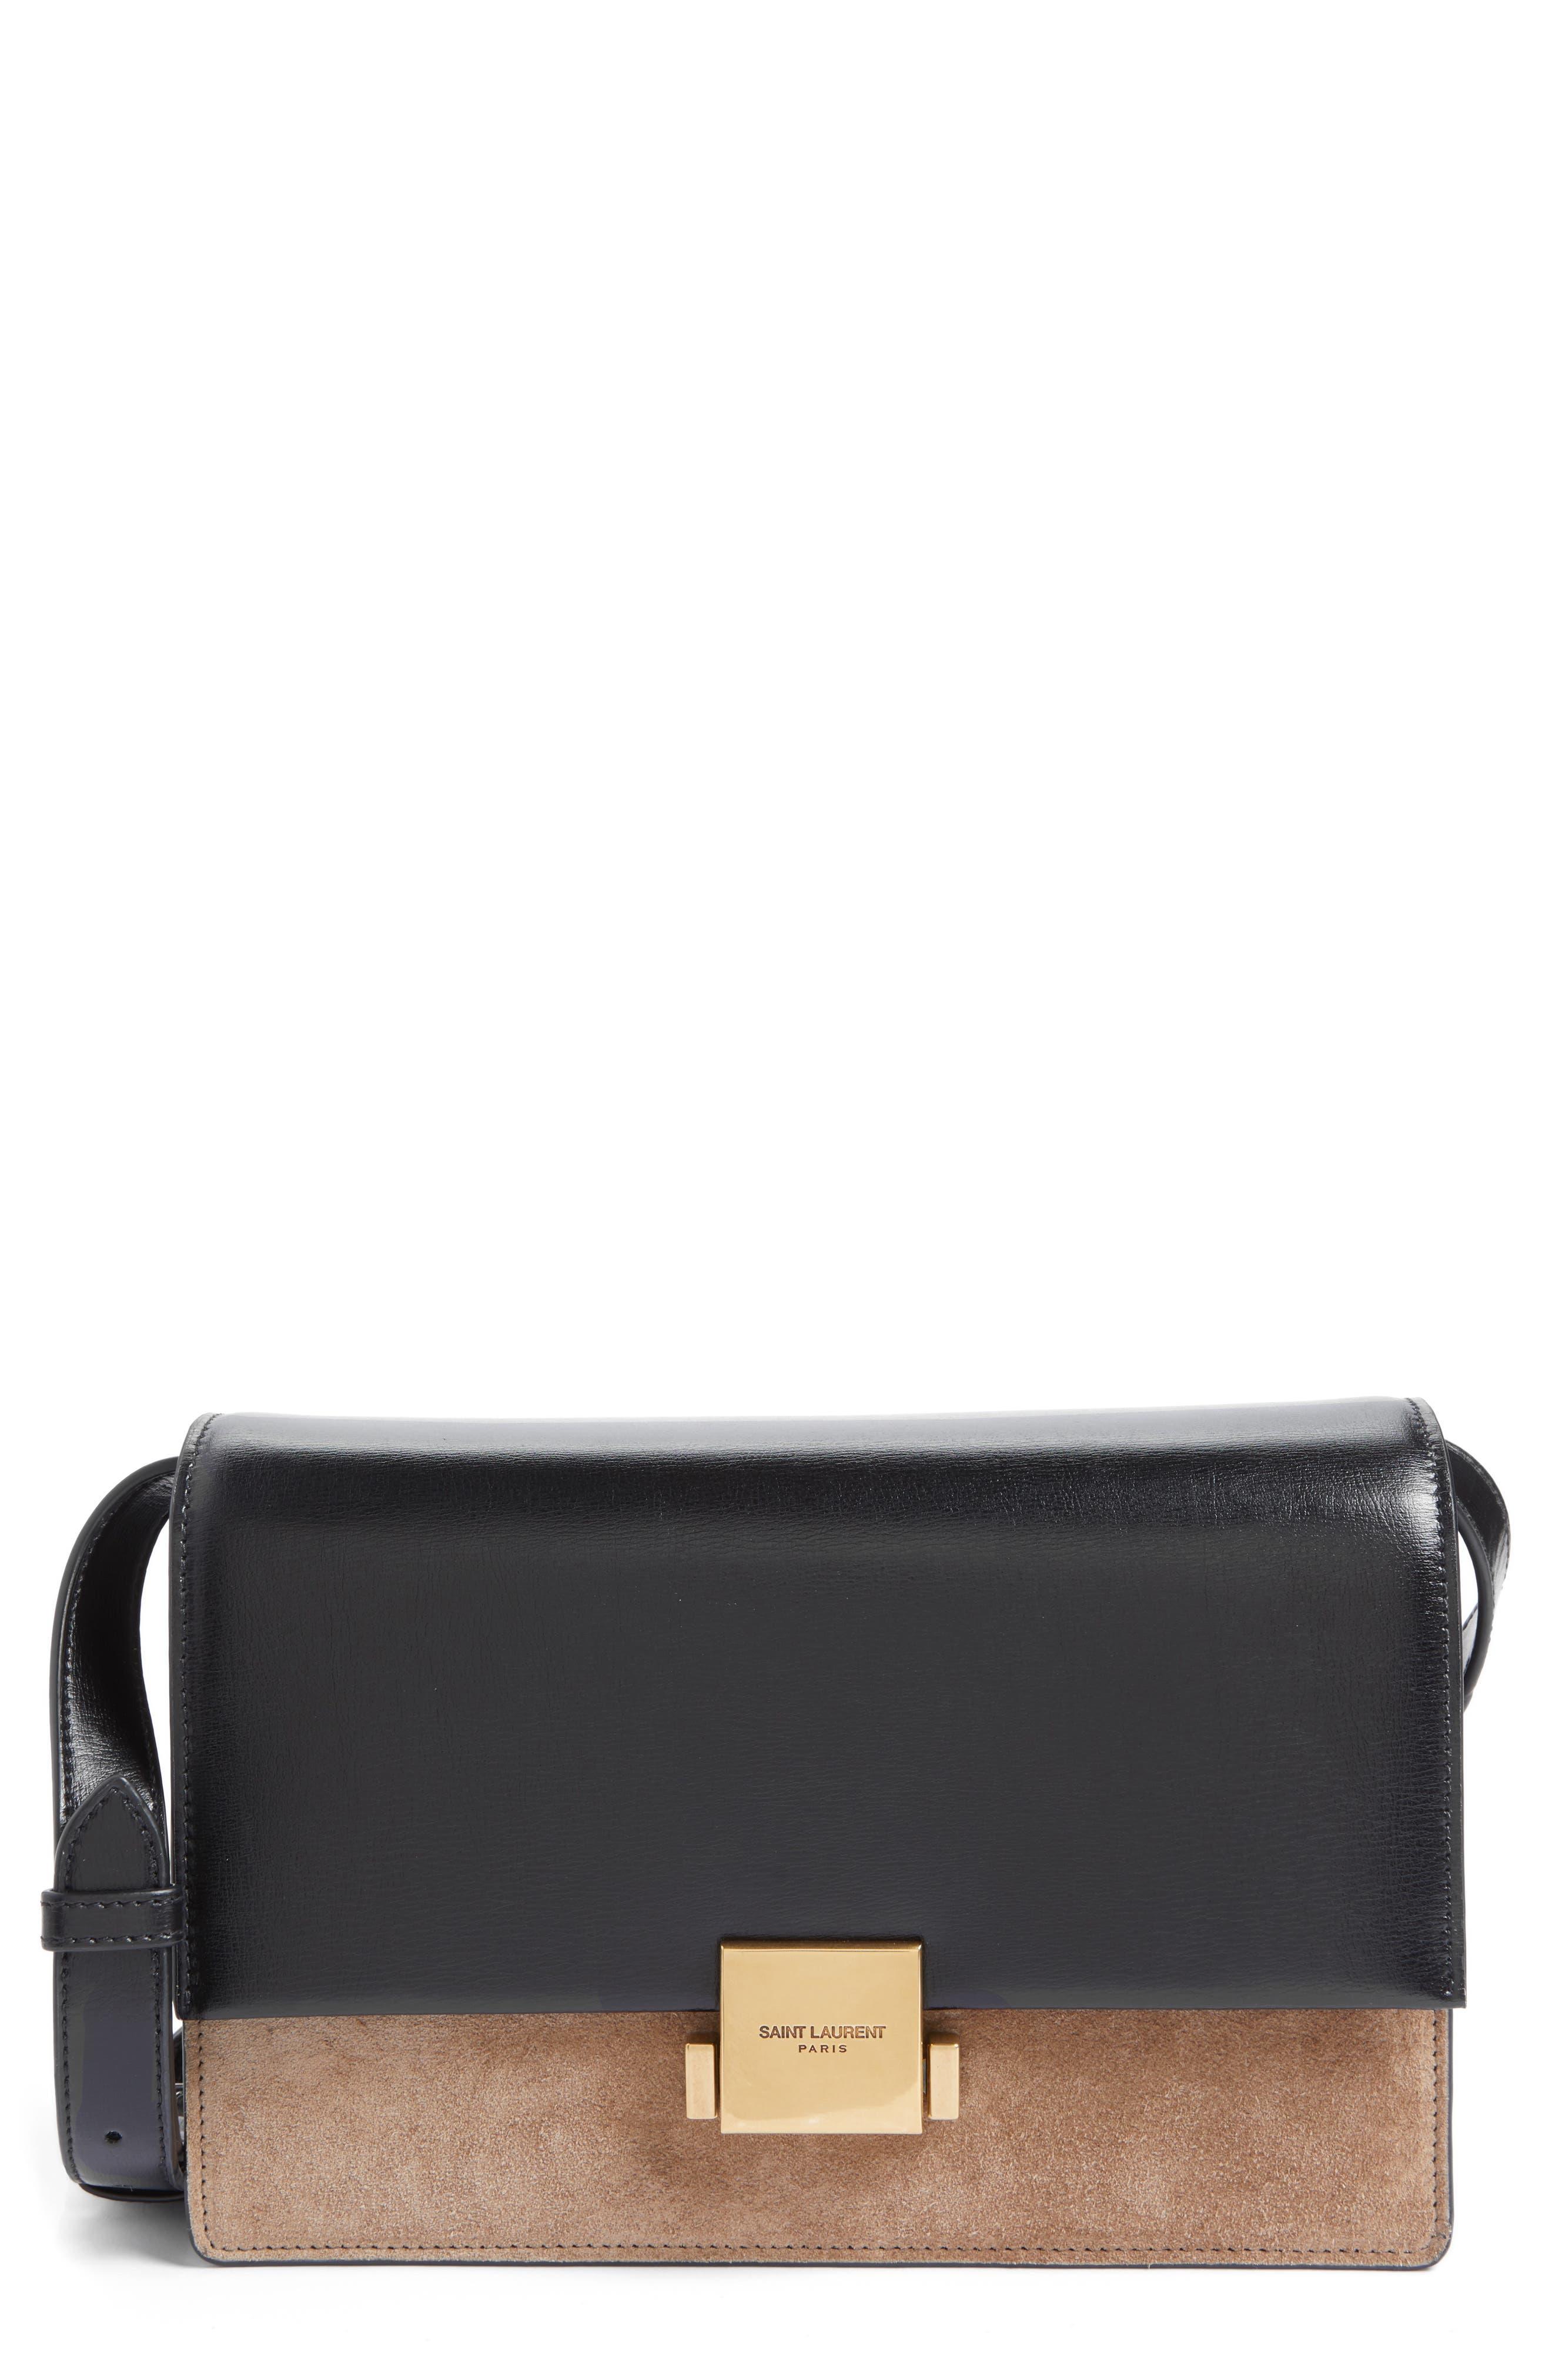 Saint Laurent Medium Bellechasse Suede & Leather Shoulder Bag